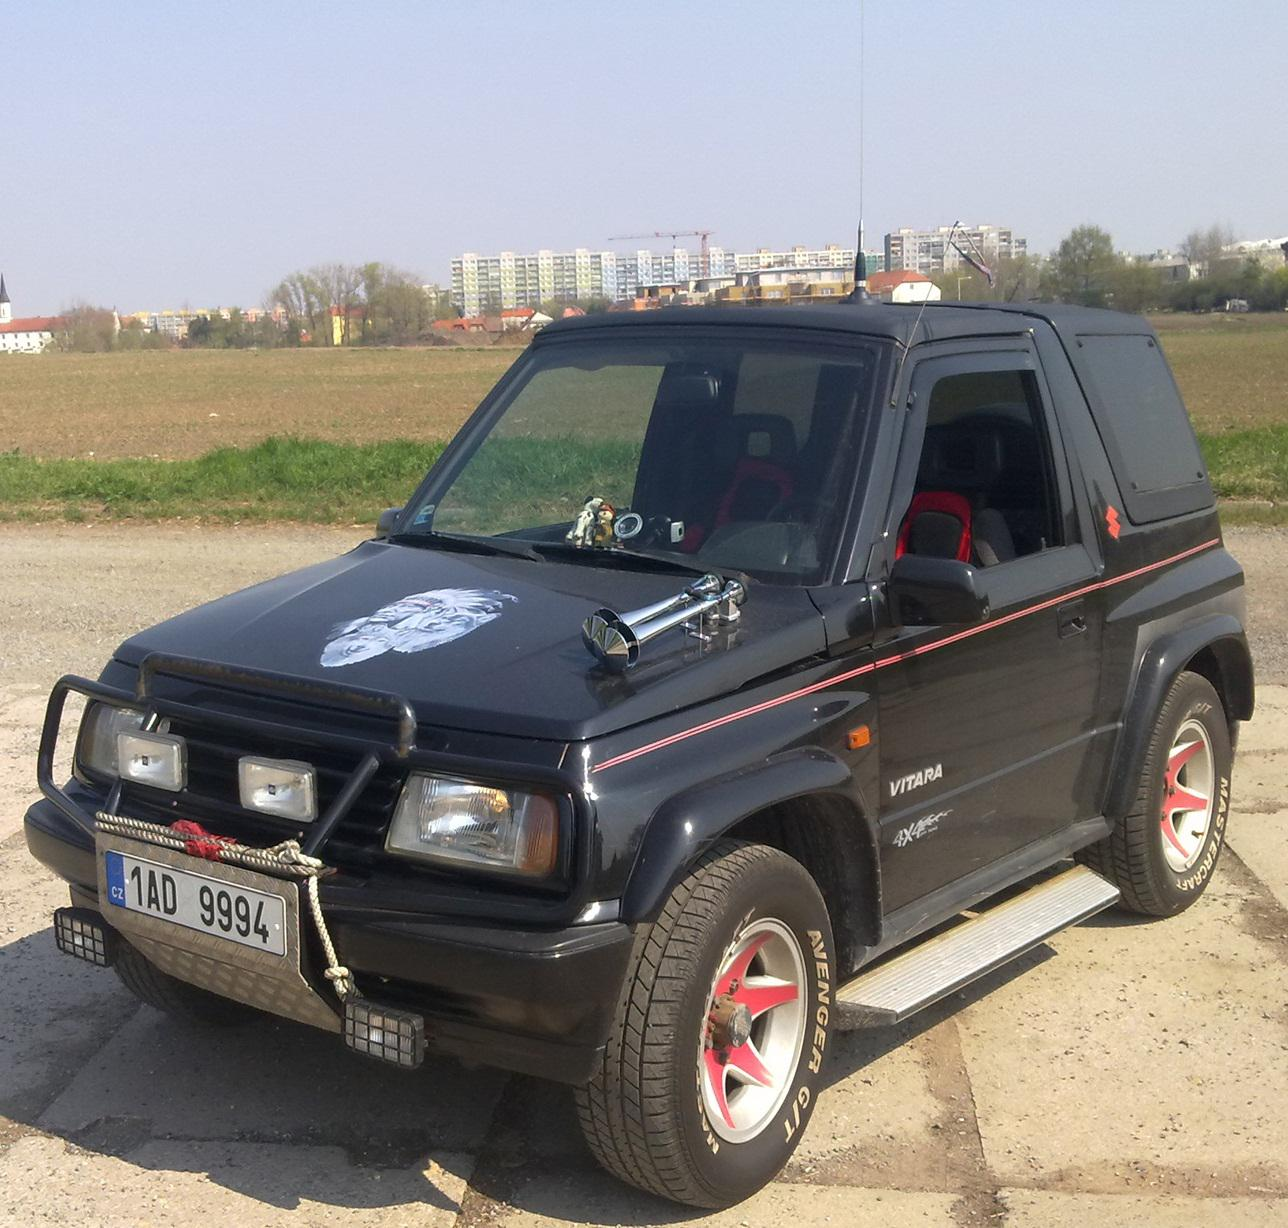 1995 Suzuki Vitara    Escudo    Sidekick